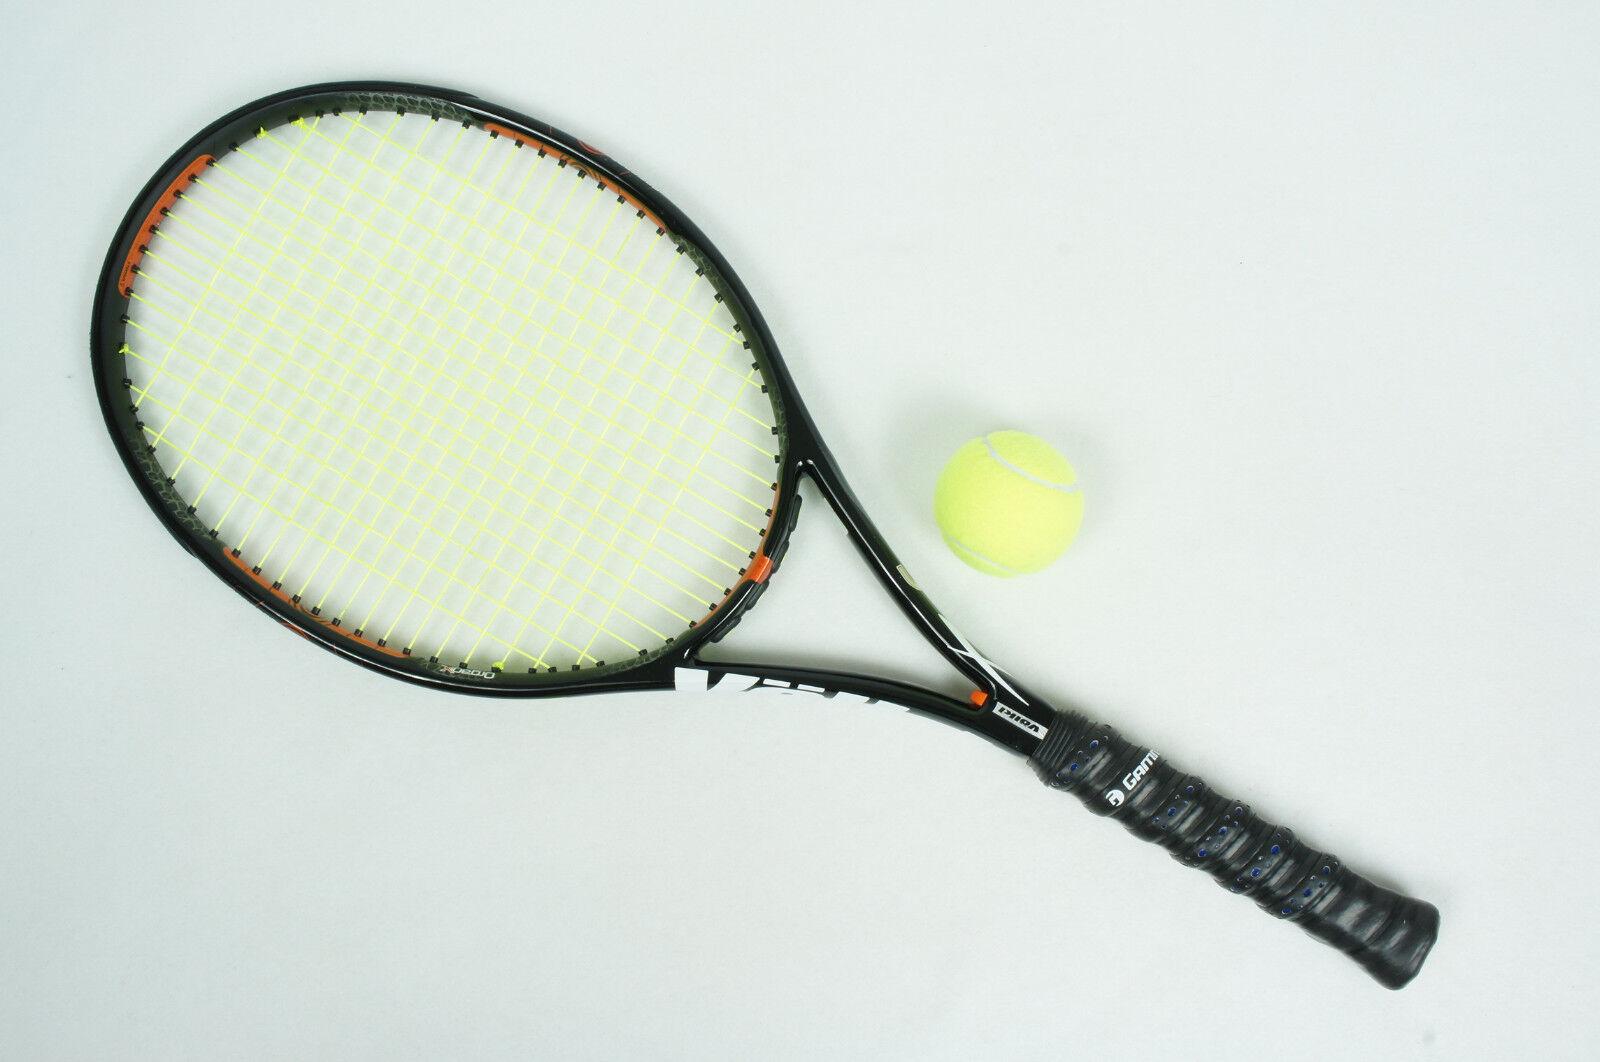 Volkl Organix 9 4 1 8 Tennis Racquet ( 2676)